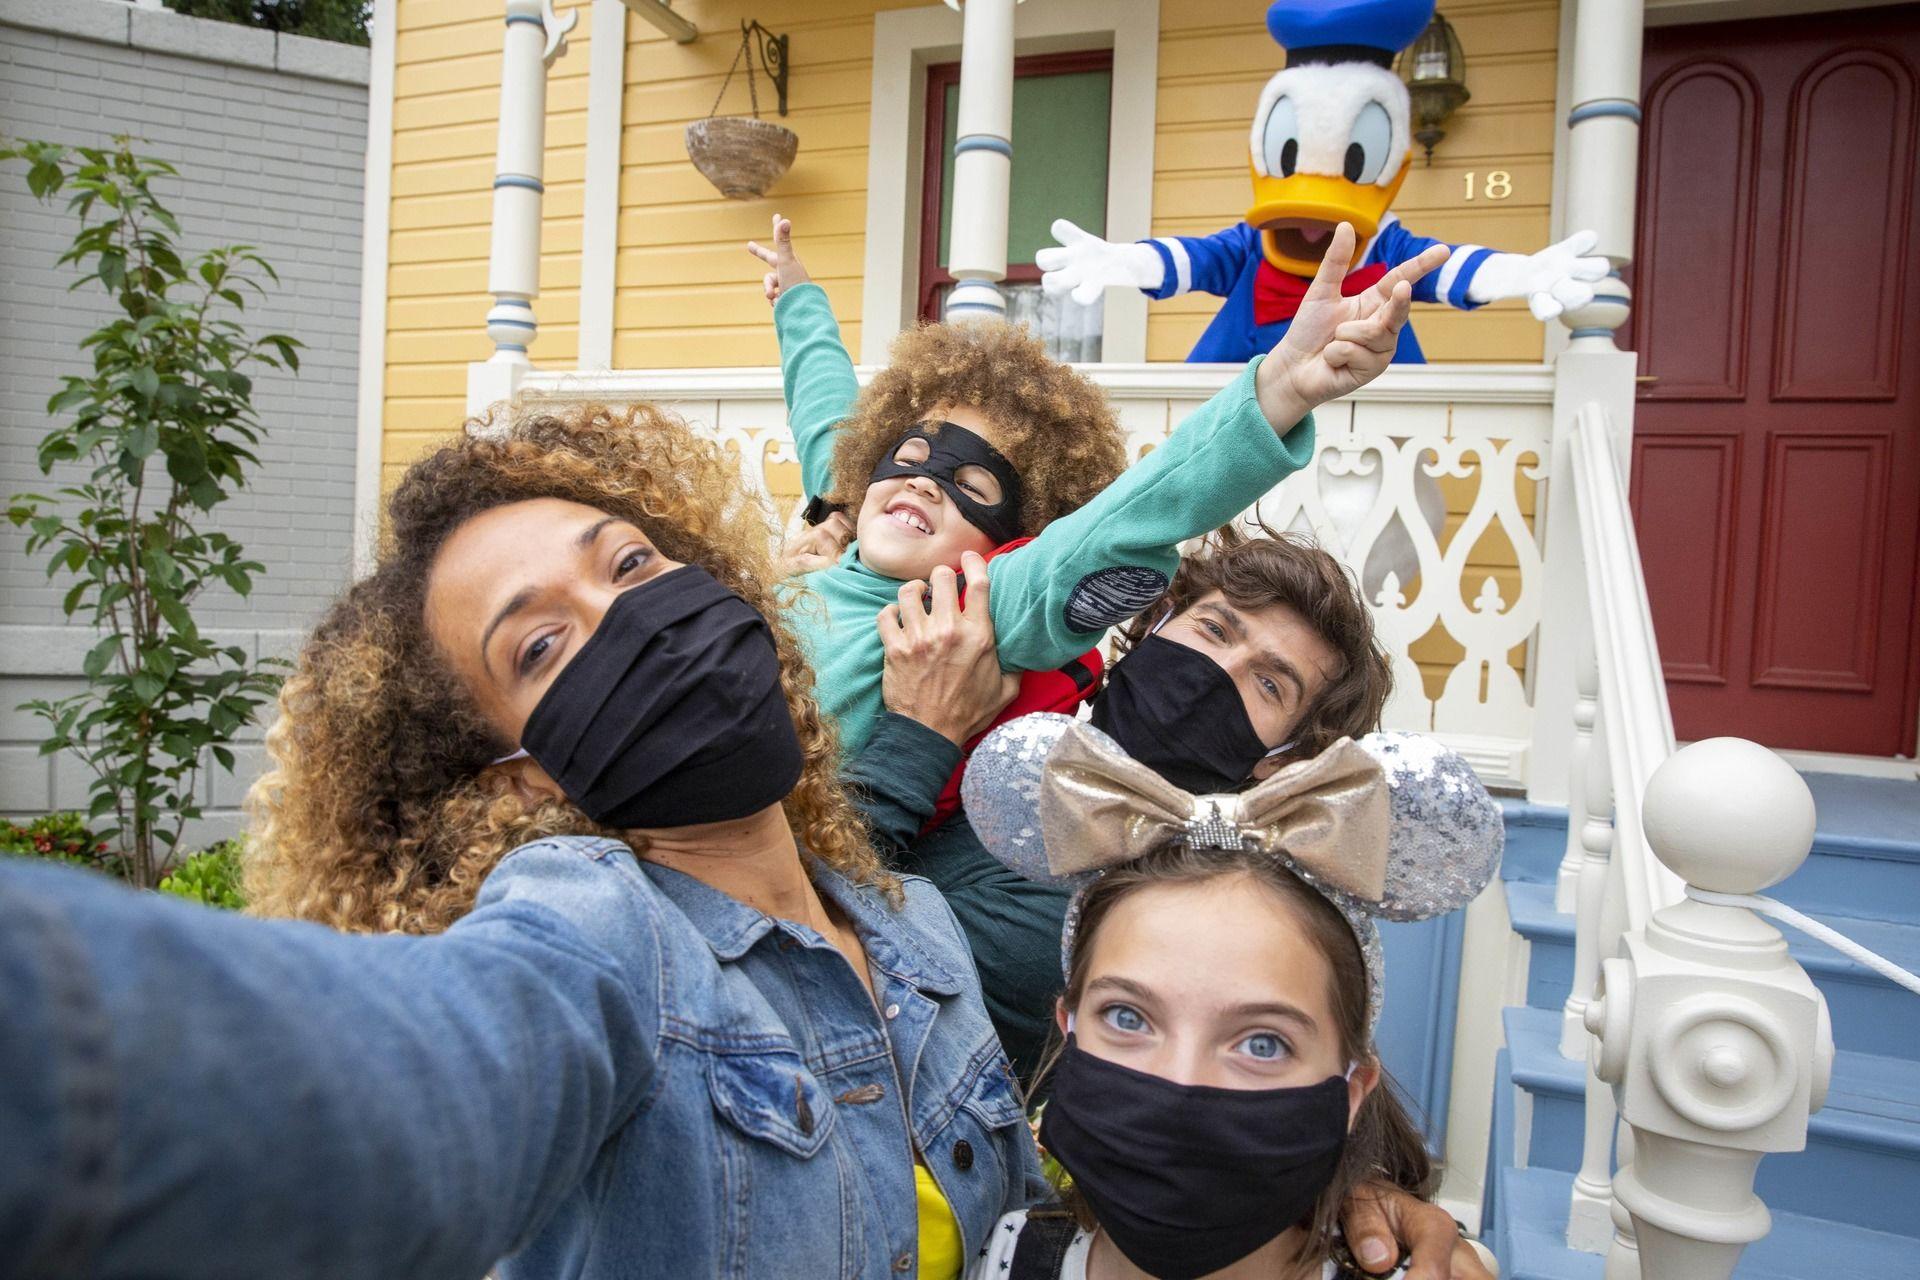 France - Ile de France - Disneyland Paris - Paris - Disney's Hotel New York - The Art of Marvel : Admirez la superpuissance MARVEL !